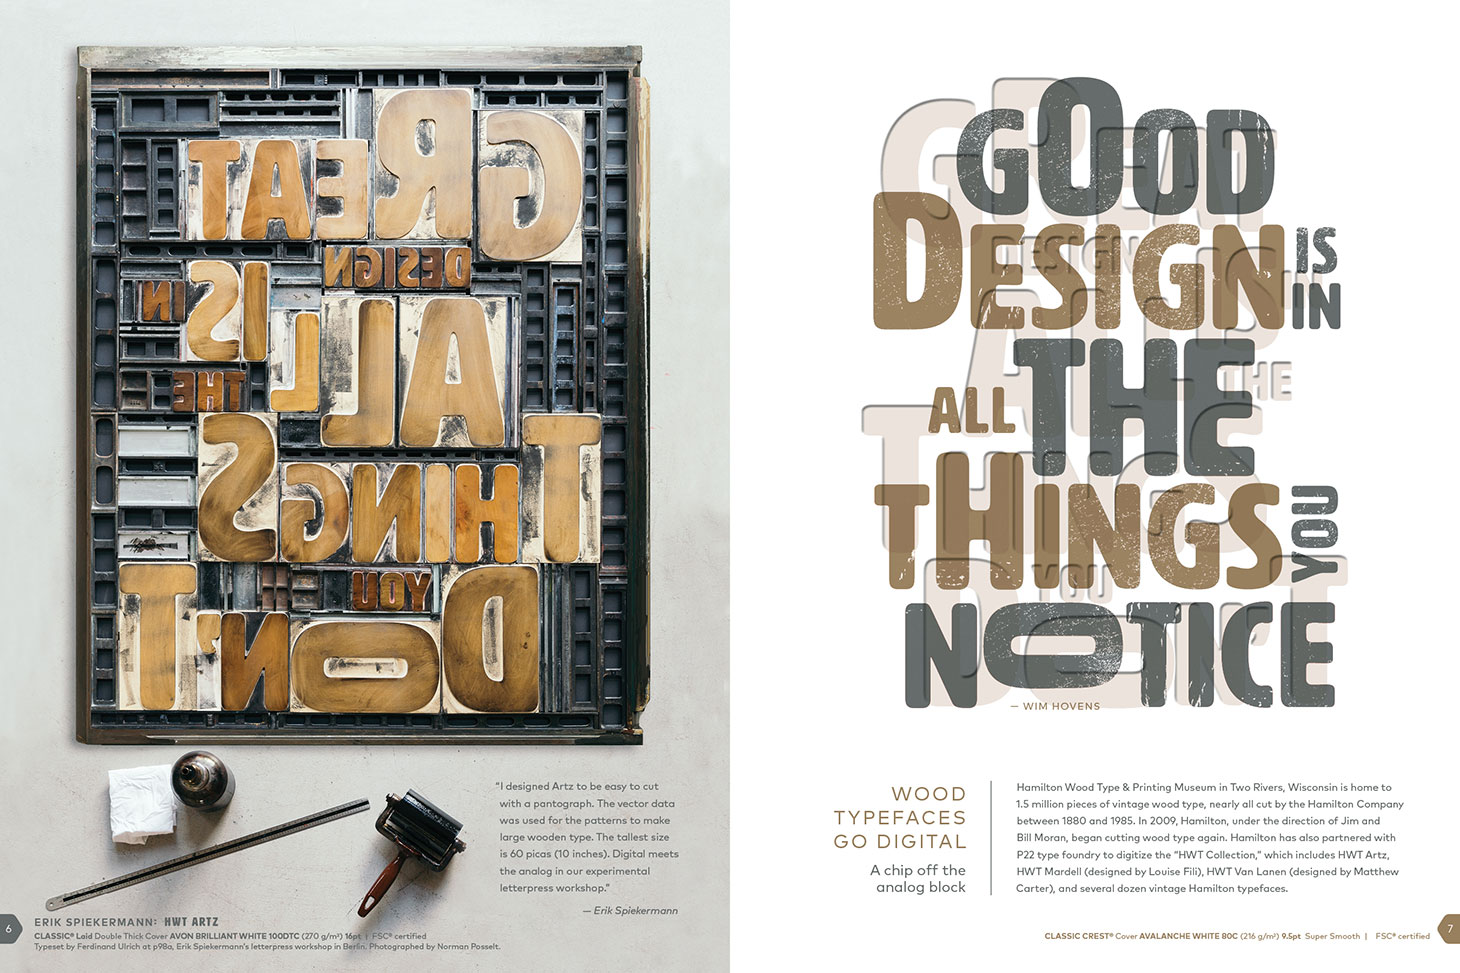 Featuring Erik Spiekermann's HWT ARTZ typeface on Neenah Classic Crest